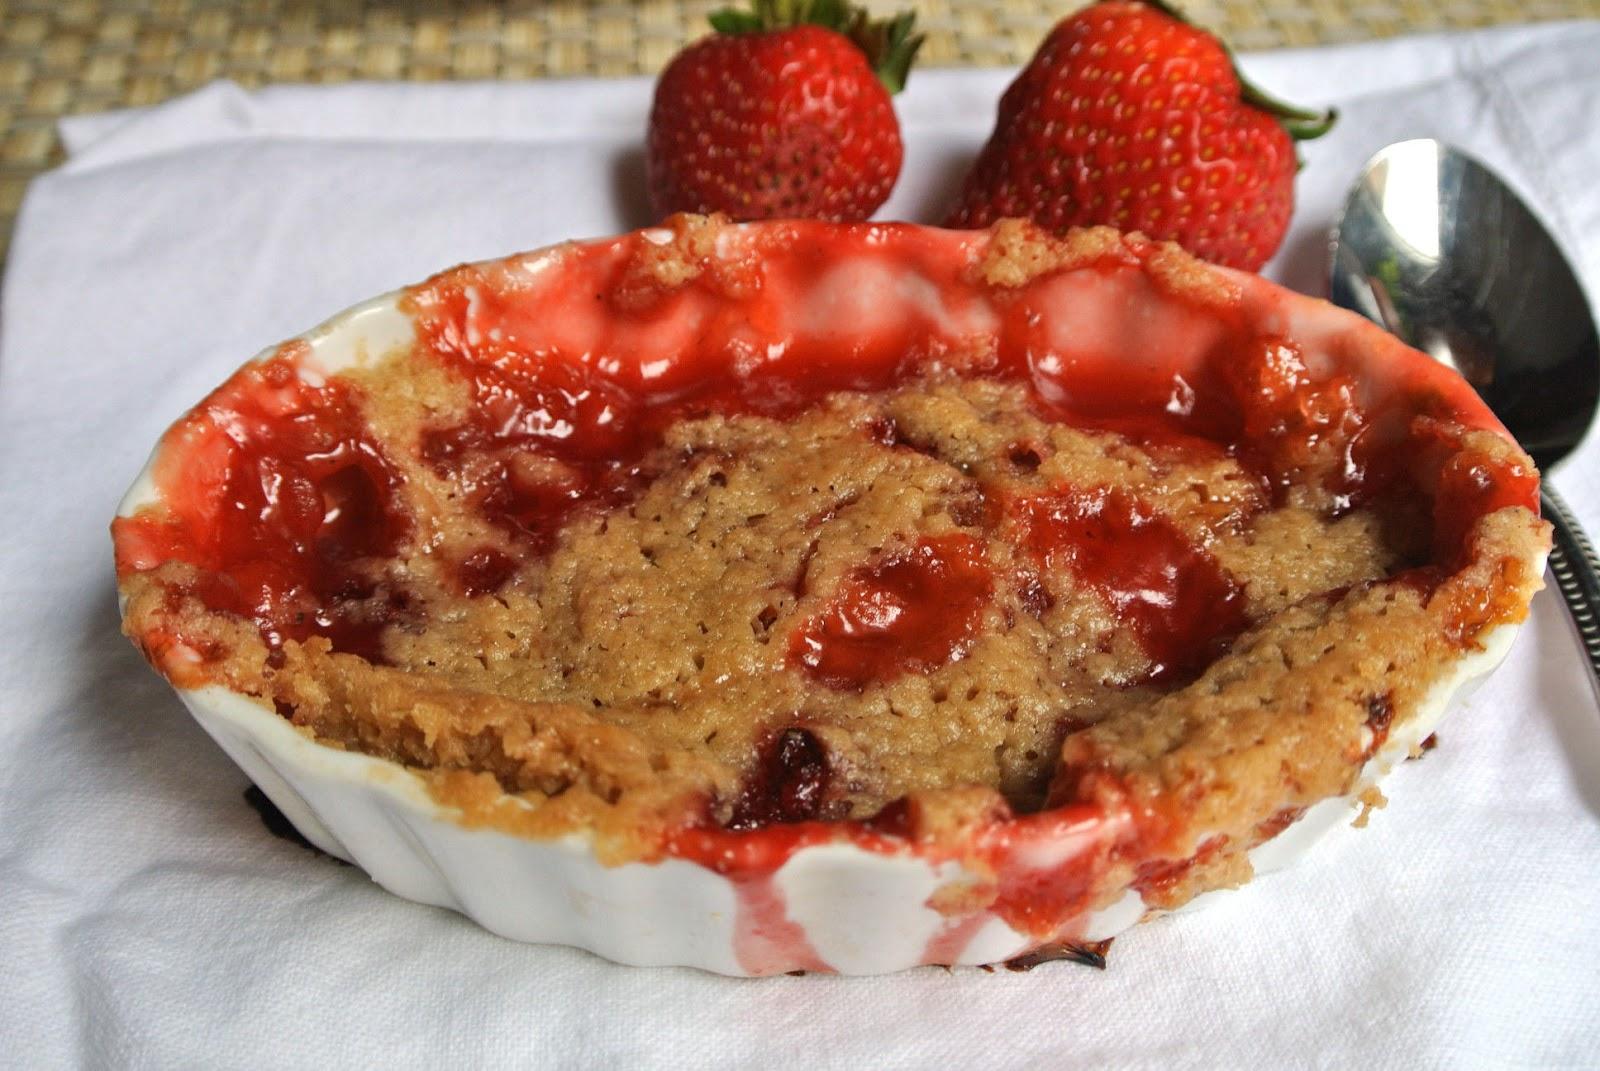 Mom, What's For Dinner?: Sugar Free Strawberry Cobbler